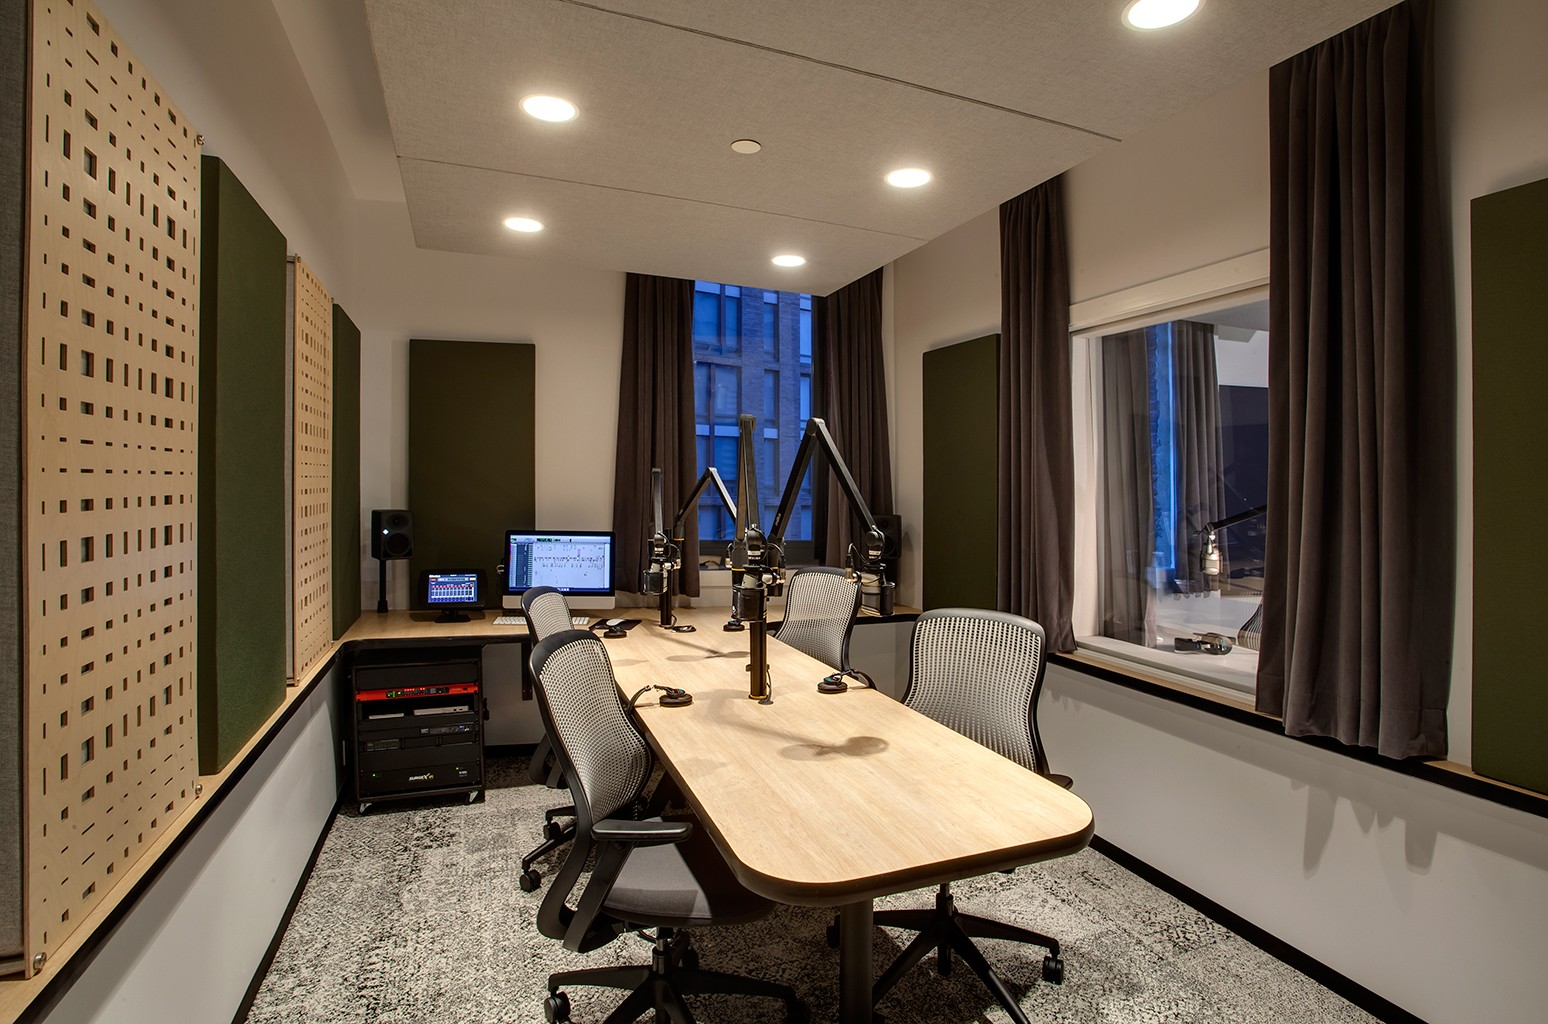 Studio 3 at Gimlet Media's Brooklyn headquarters